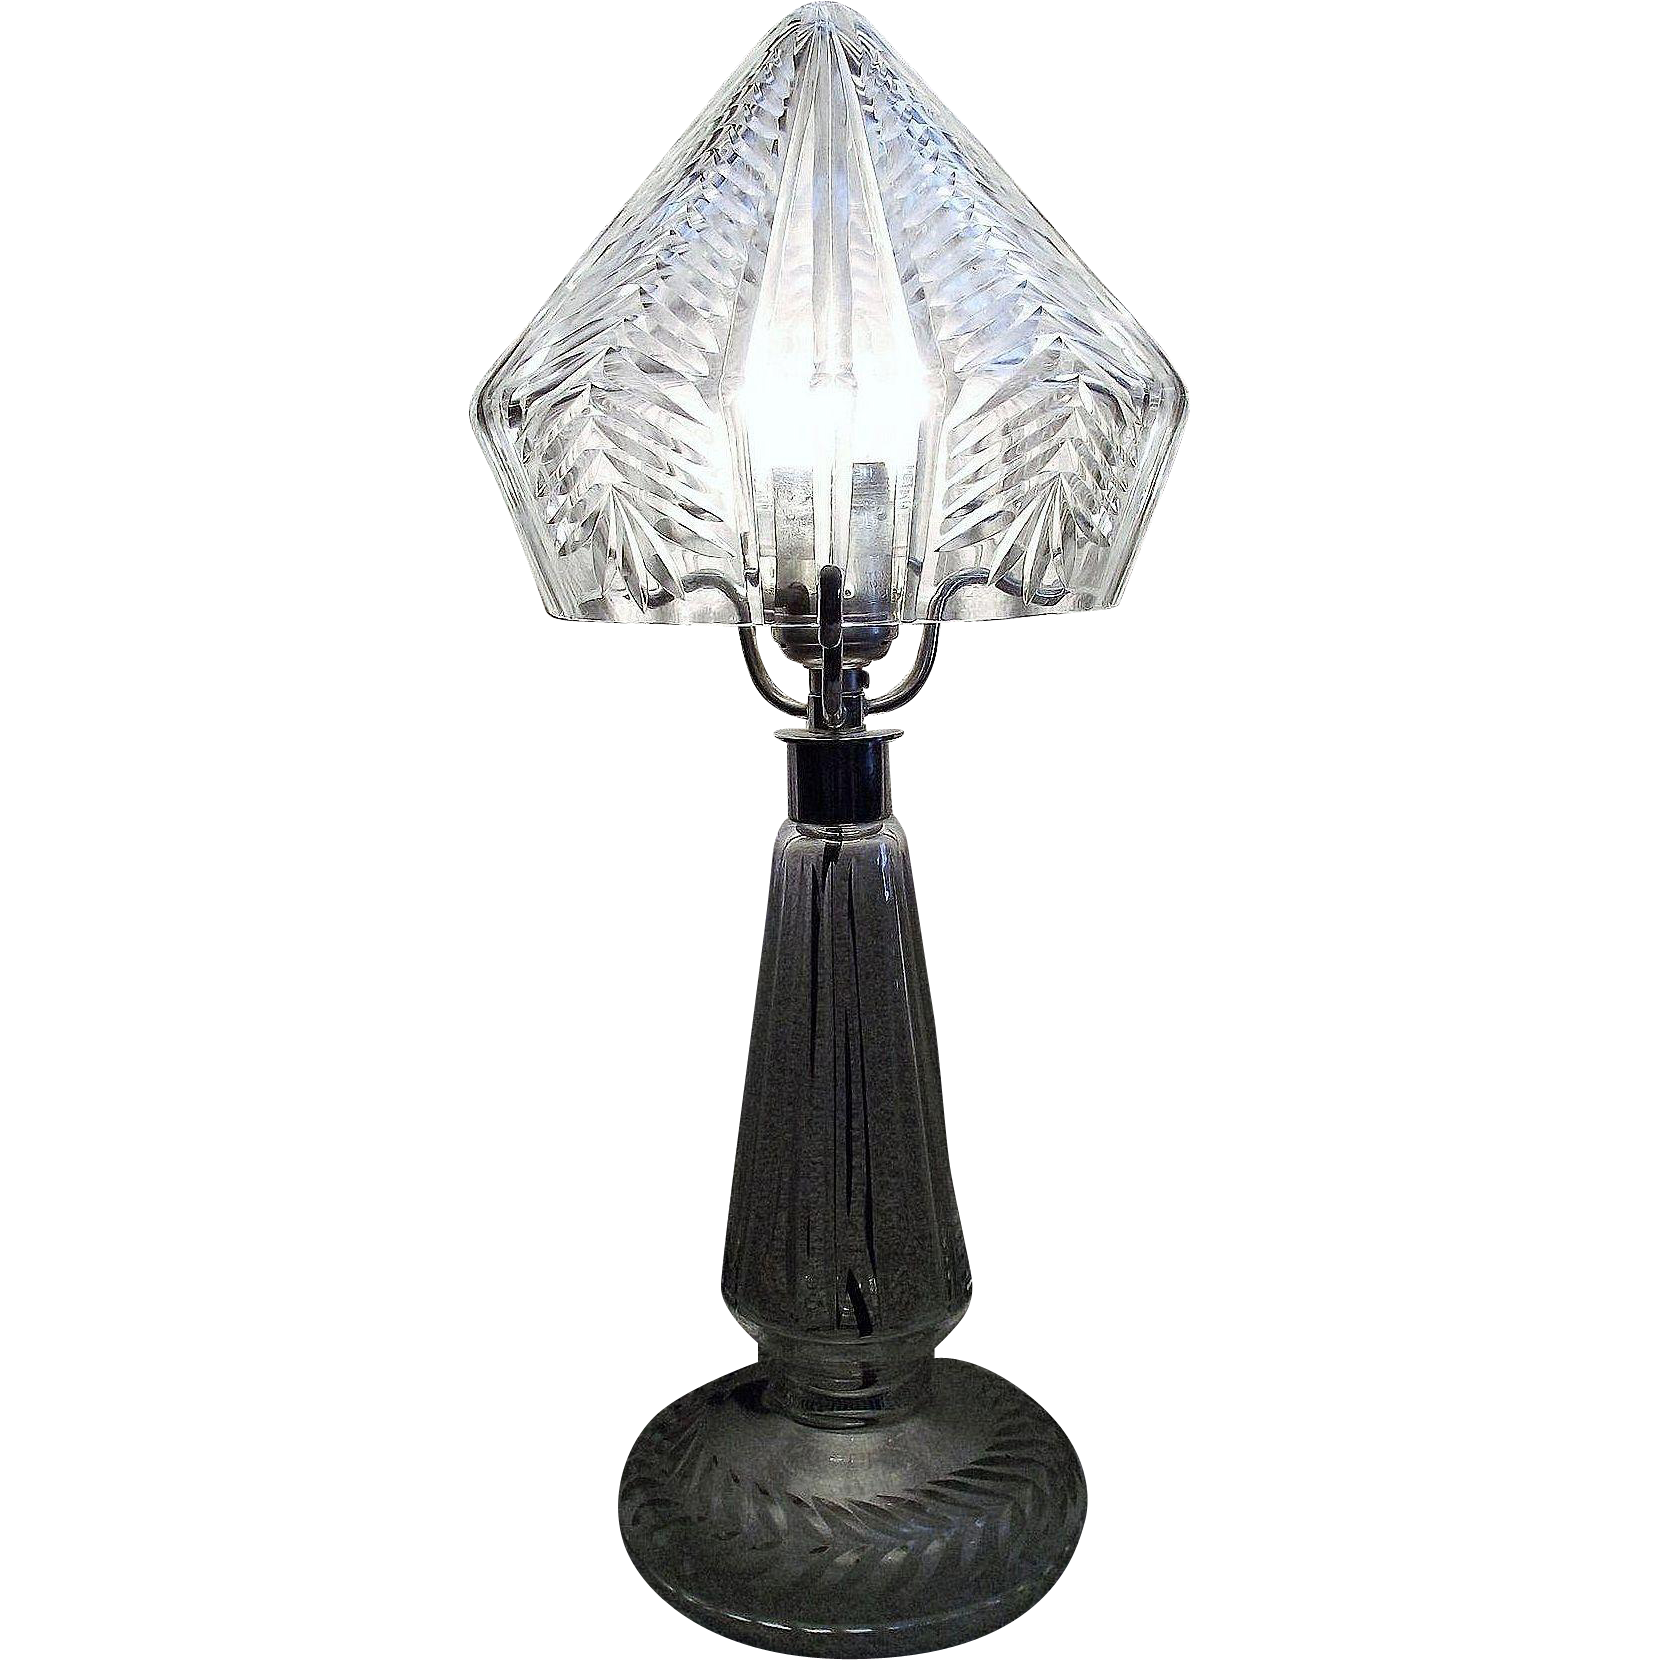 """Press-Cut Crystal"" Ladies Budoir Light with Nickel Plated Metal Hardware Circa 1949."